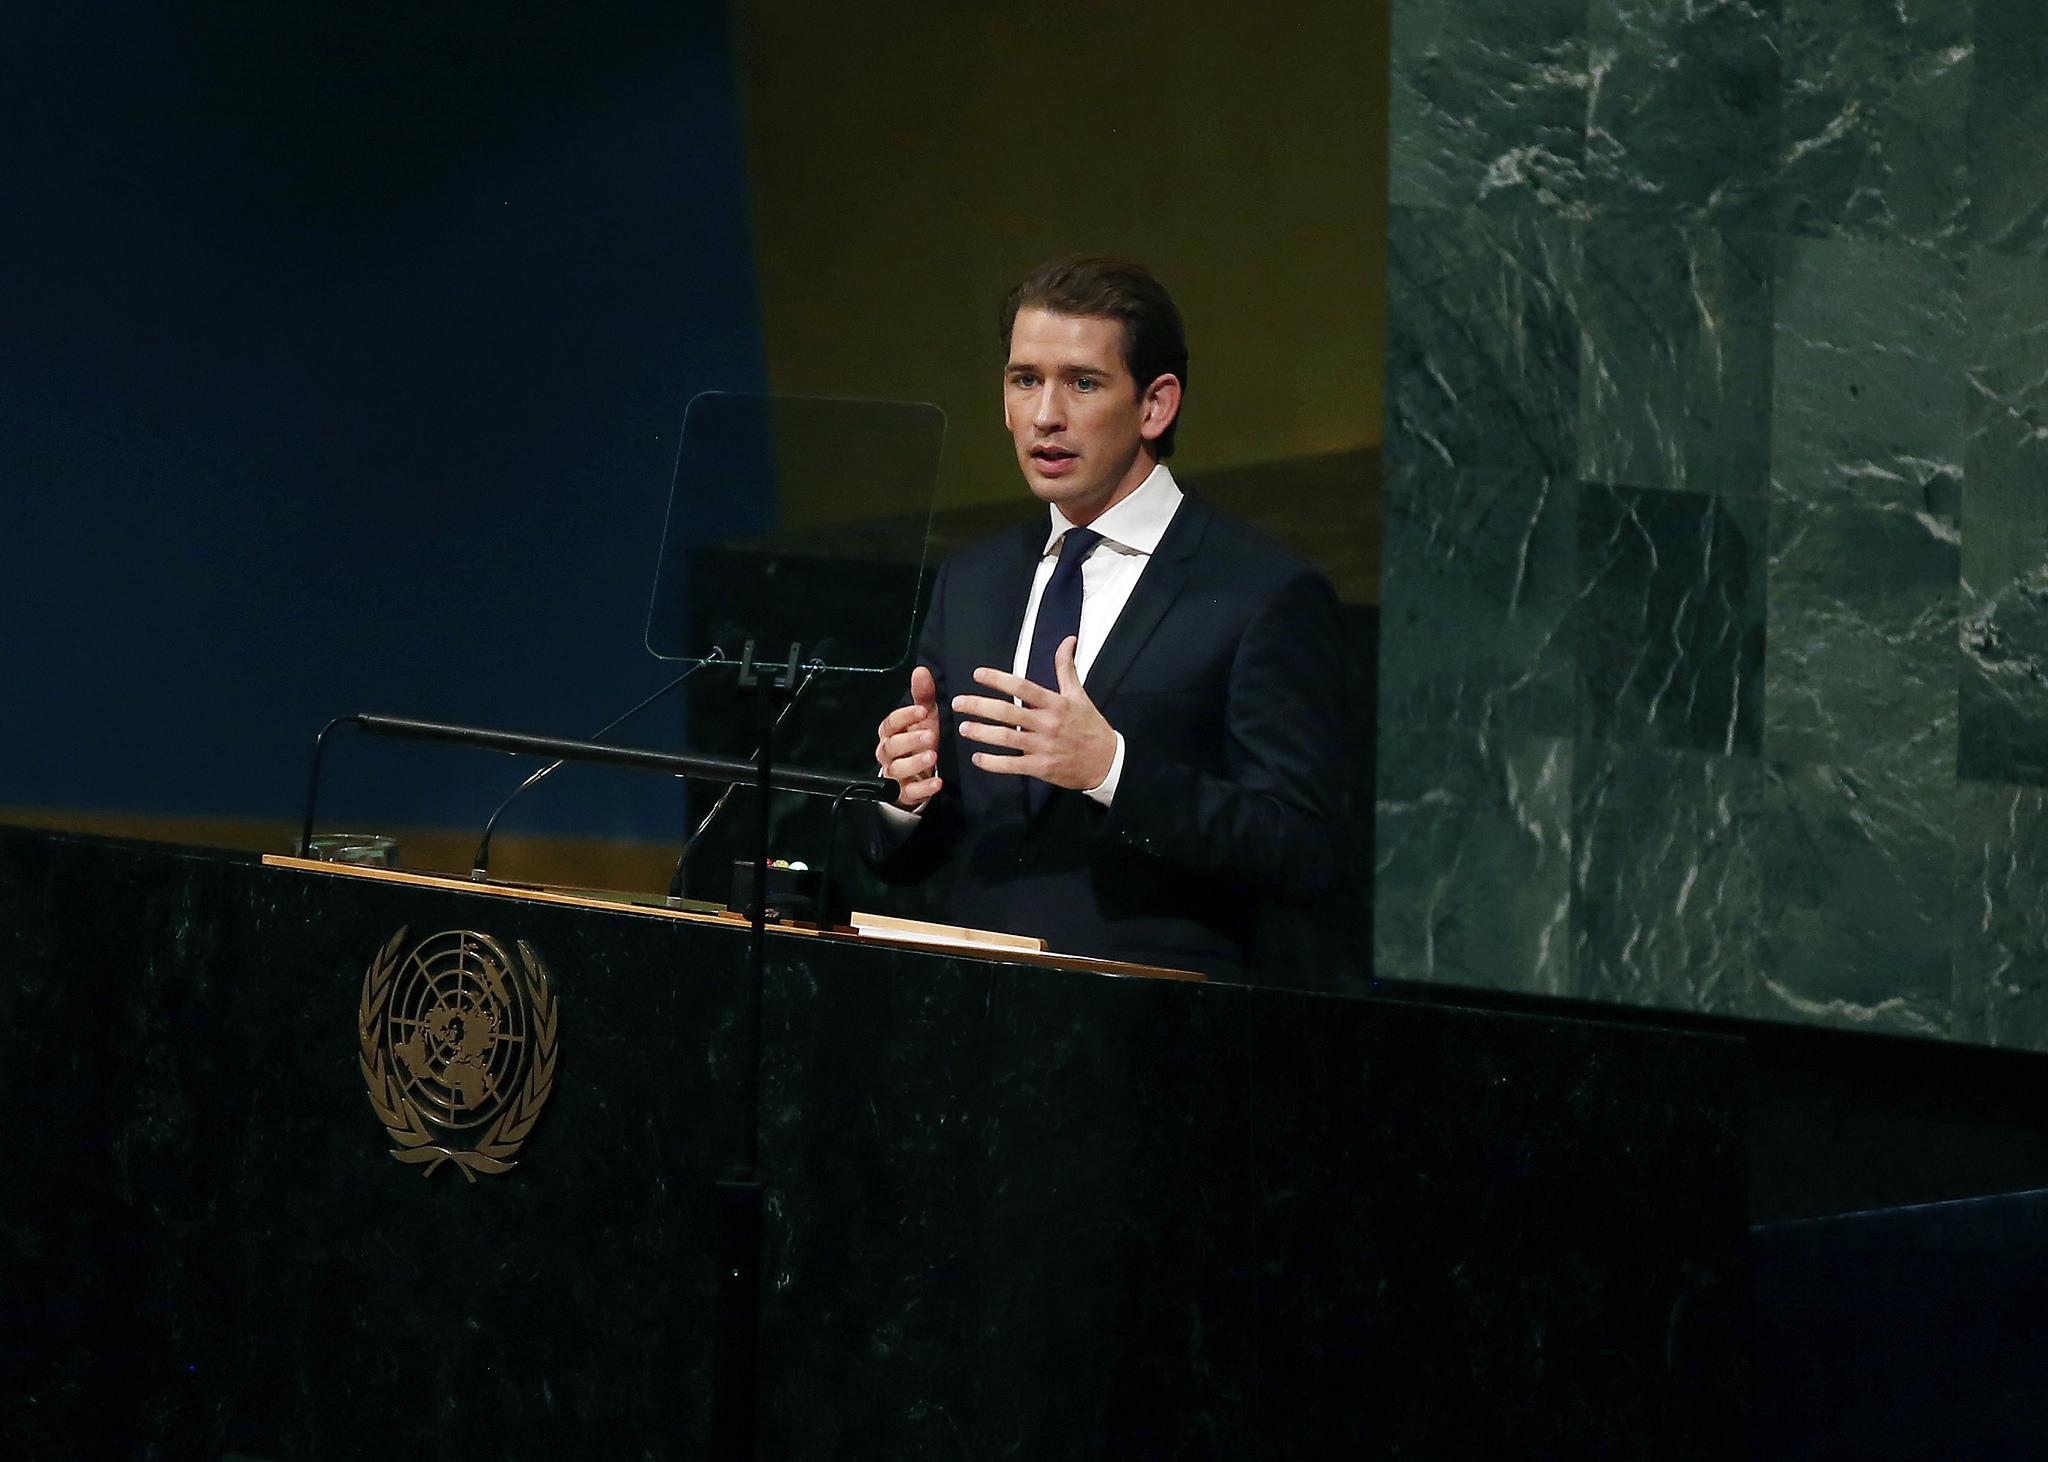 Foreign Minister Sebastian Kurz addressing the U.N. General Assembly on September 19, 2017, Photo: Dragan Tatic